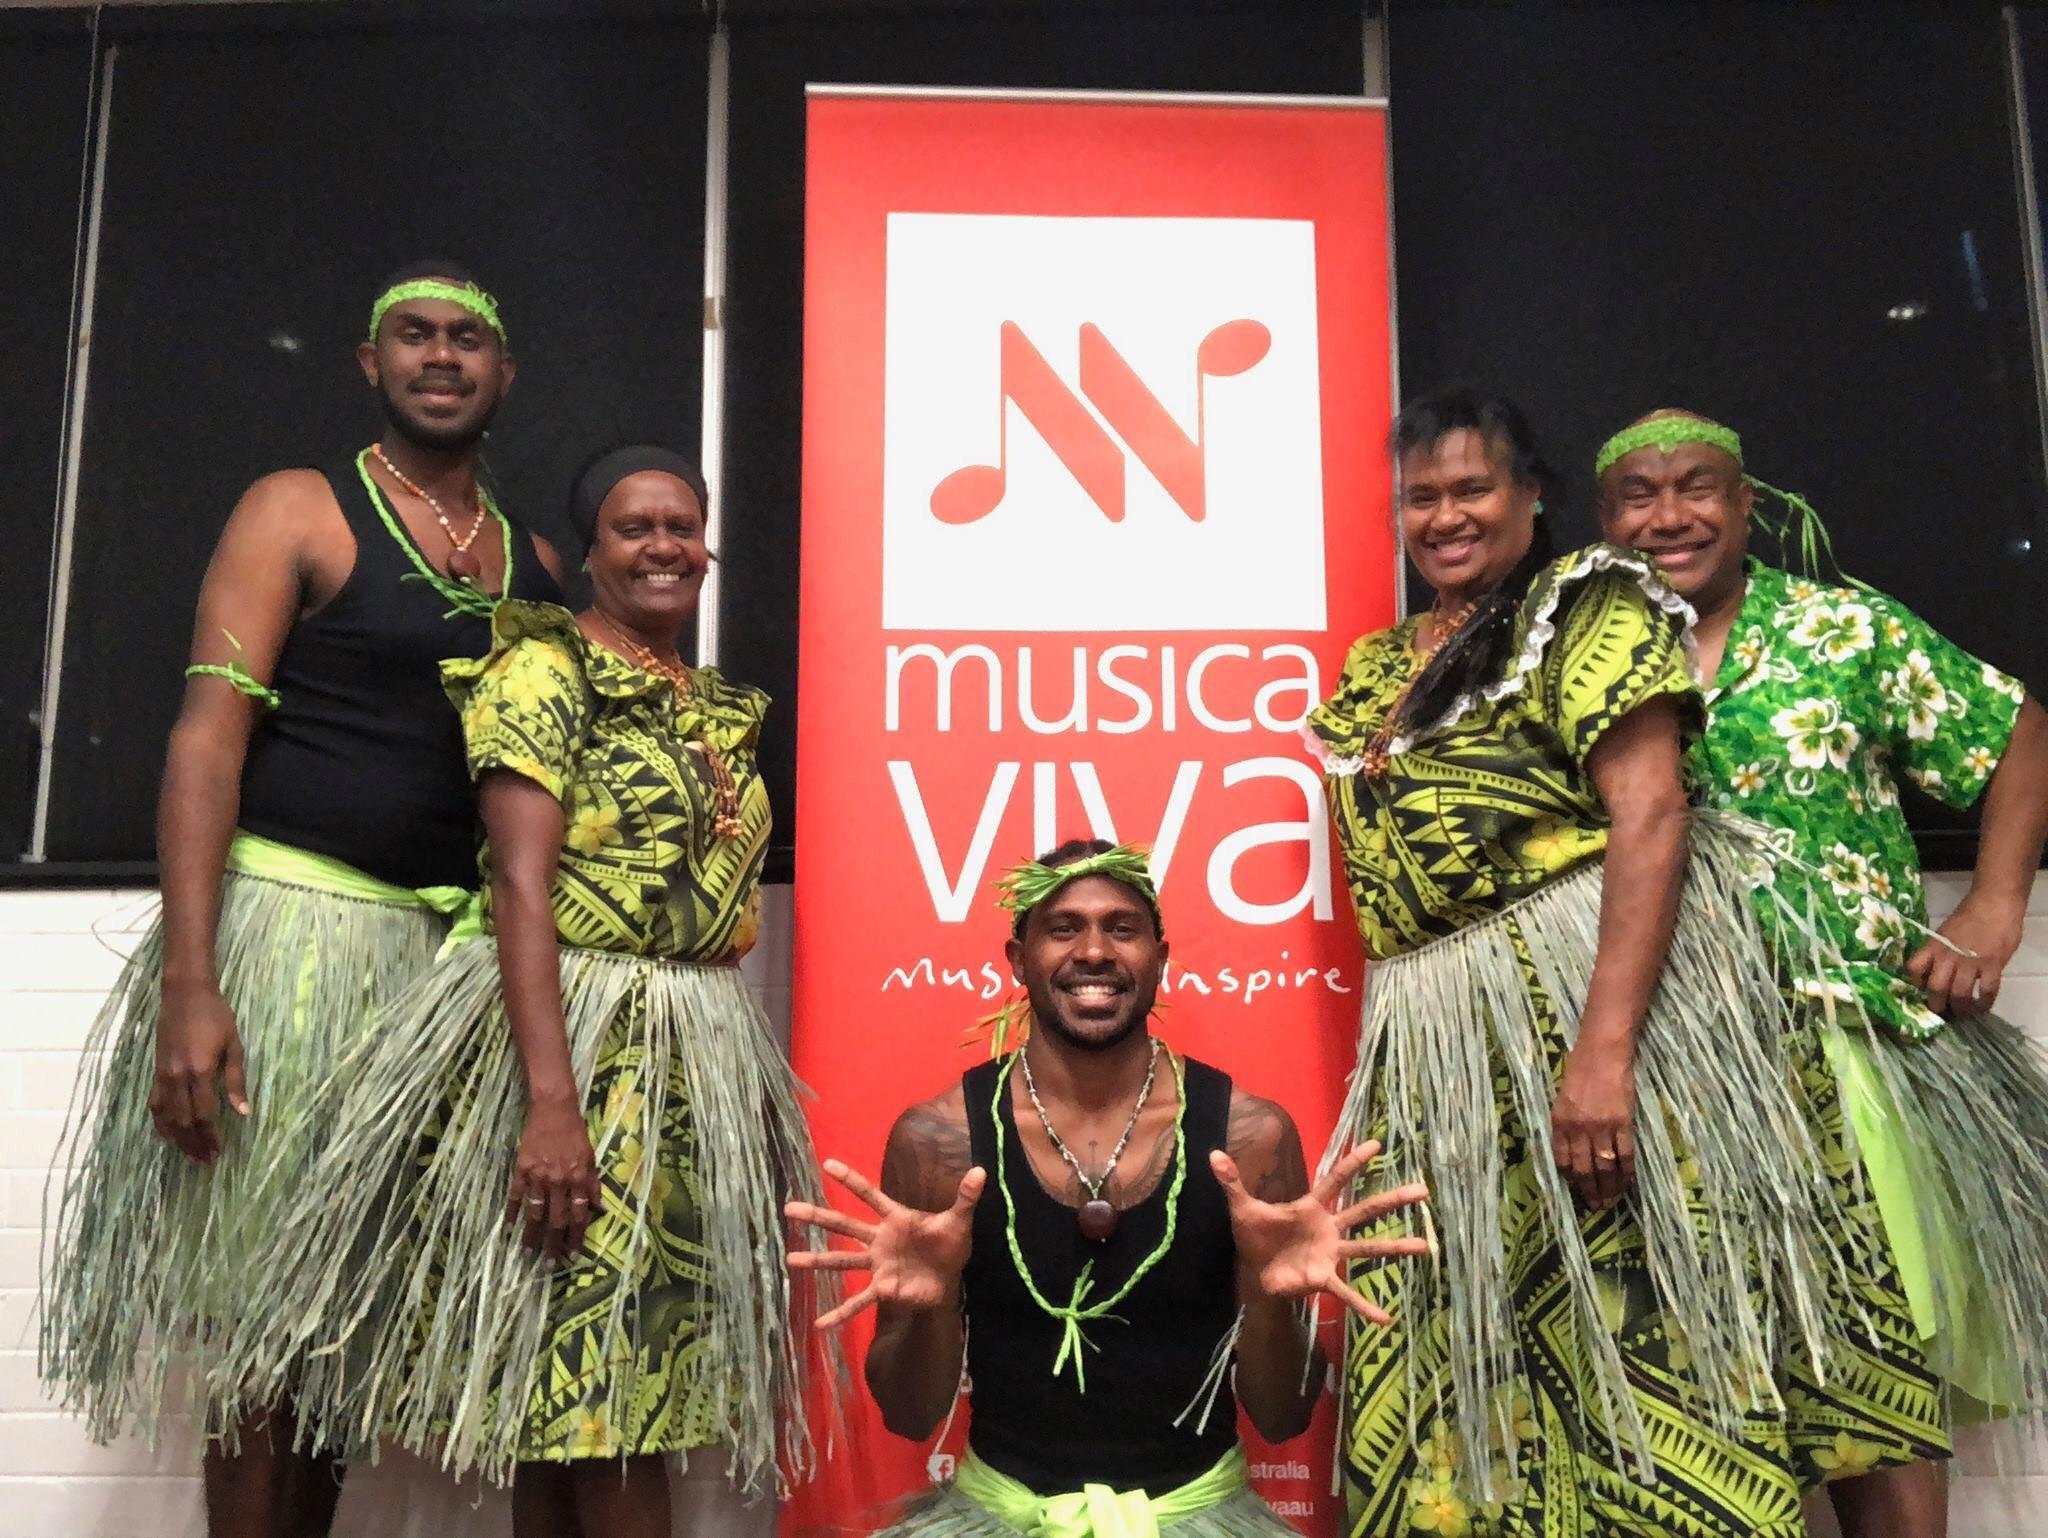 Dujon Niue (far right) and the Wyniss dance ensemble at Musica Viva